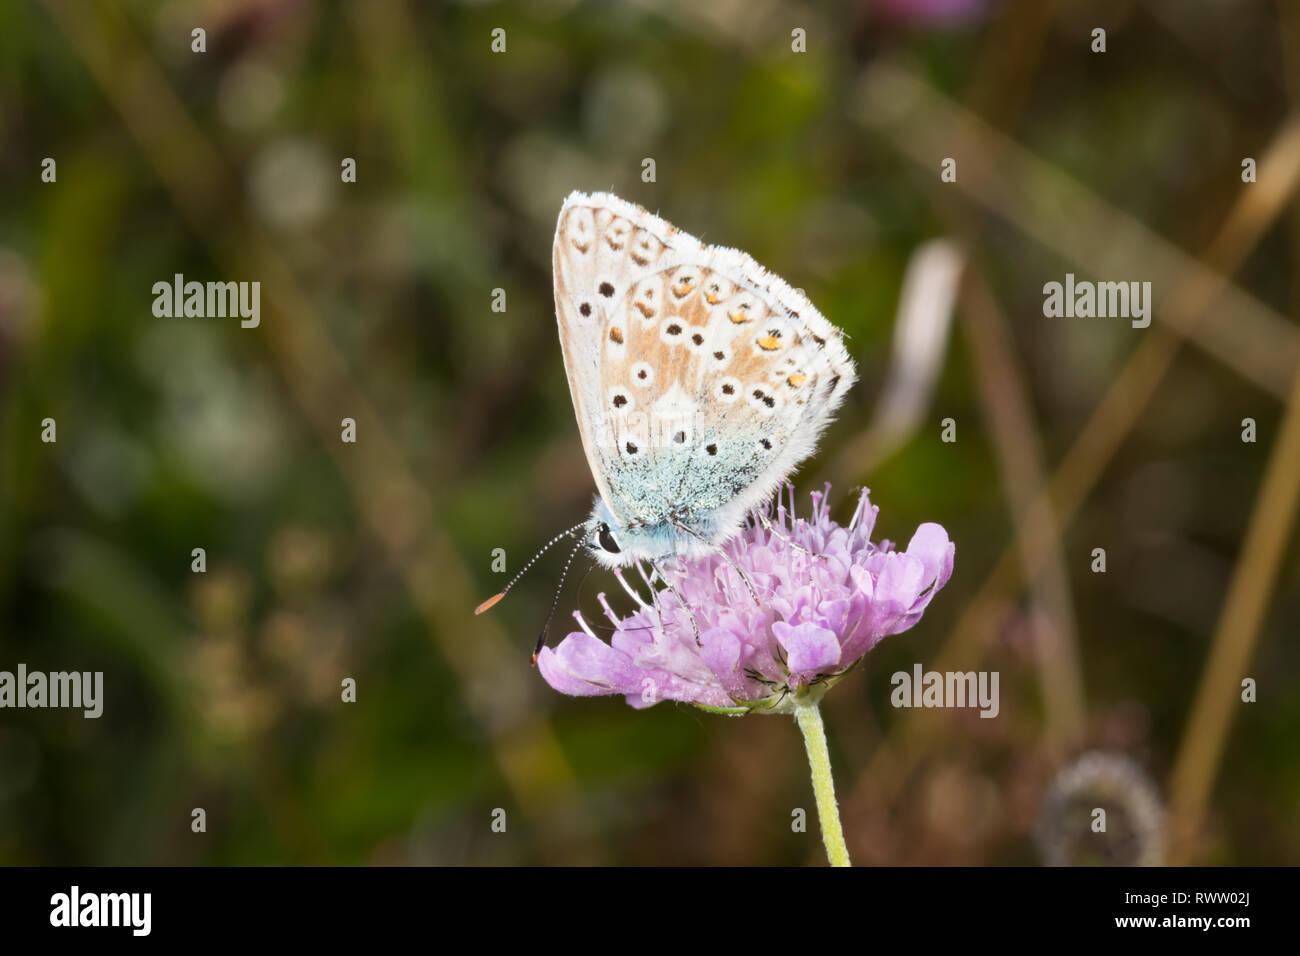 A Chalk Hill Blue butterfly (Polyommatus coridon) feeding on a flower. - Stock Image